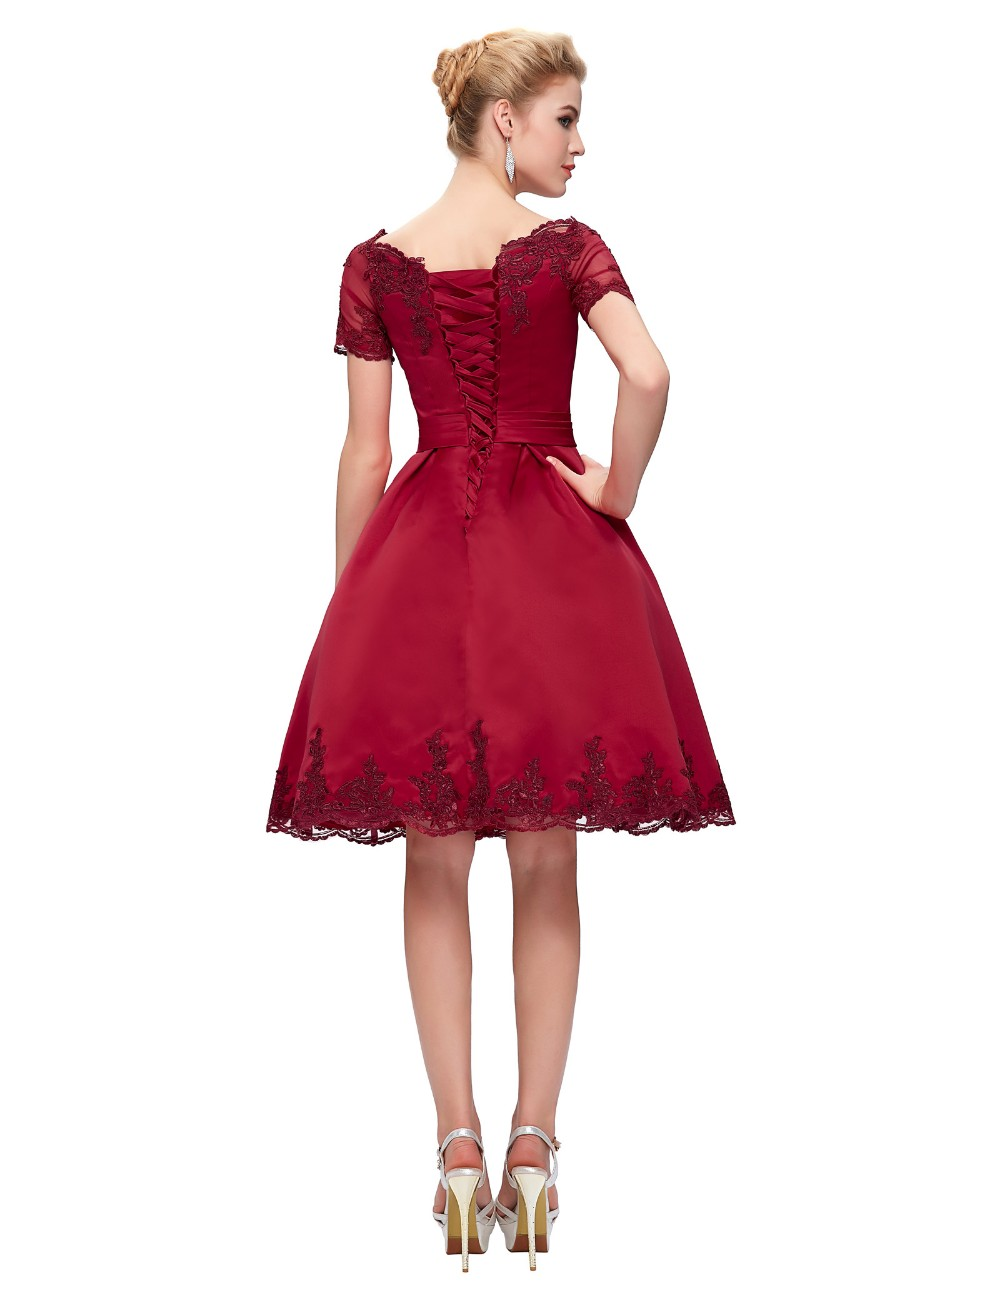 Short Cocktail Dresses 2018 Grace Karin Off The Shoulder robe de Cocktail Wedding Party Dress Satin Champagne Red Coctail Dress 6